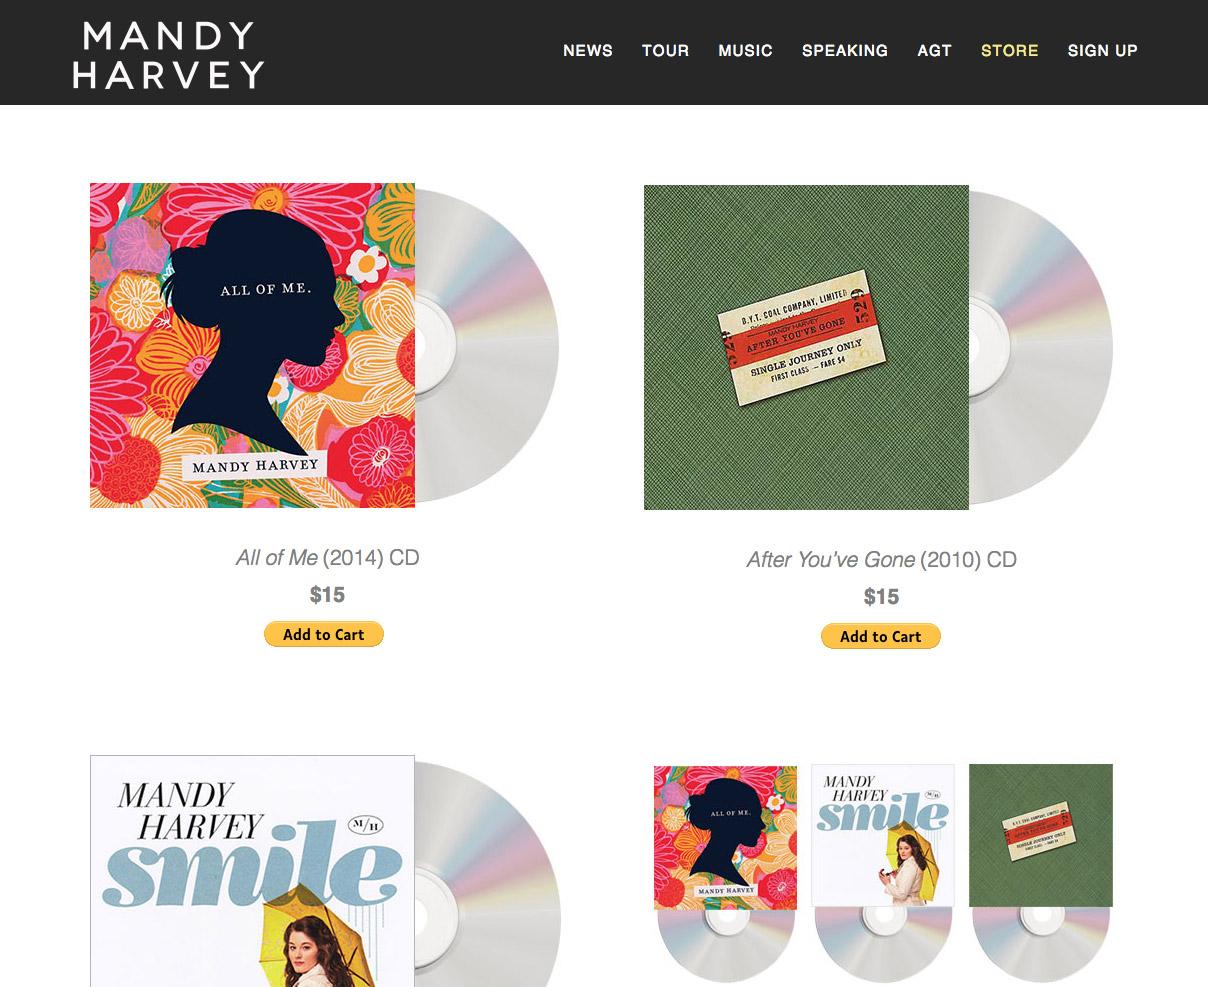 mandy harvey website screenshot of webstore